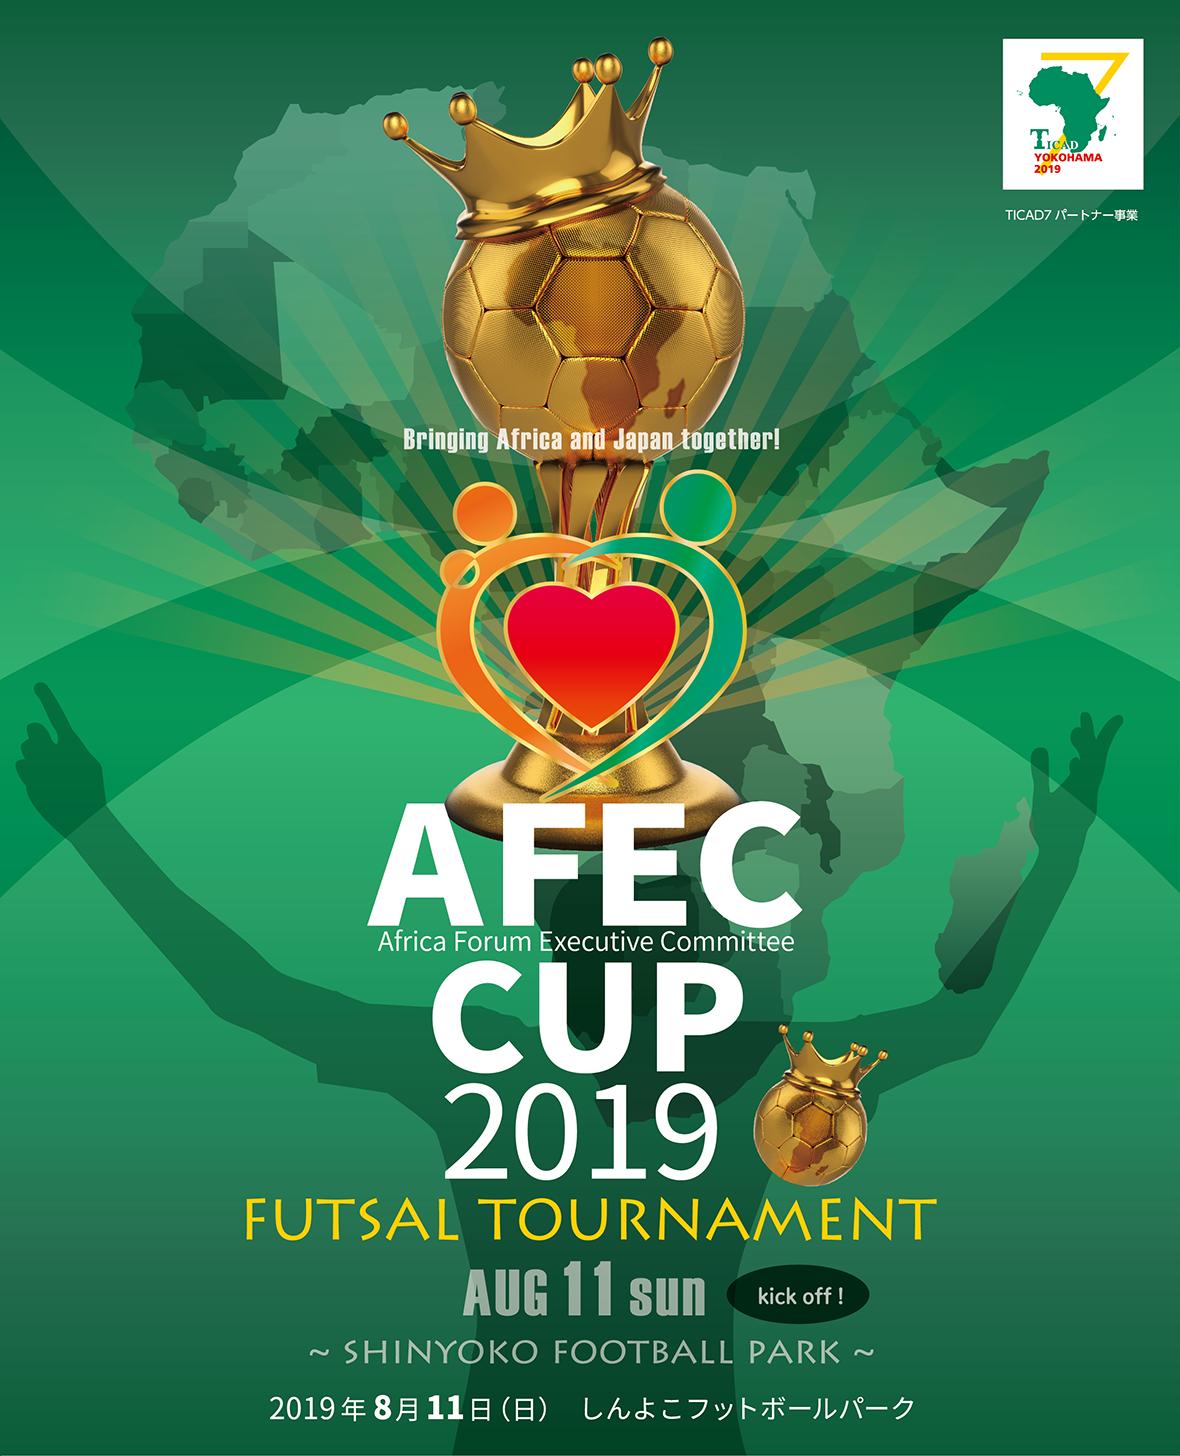 AFEC CUP 2019